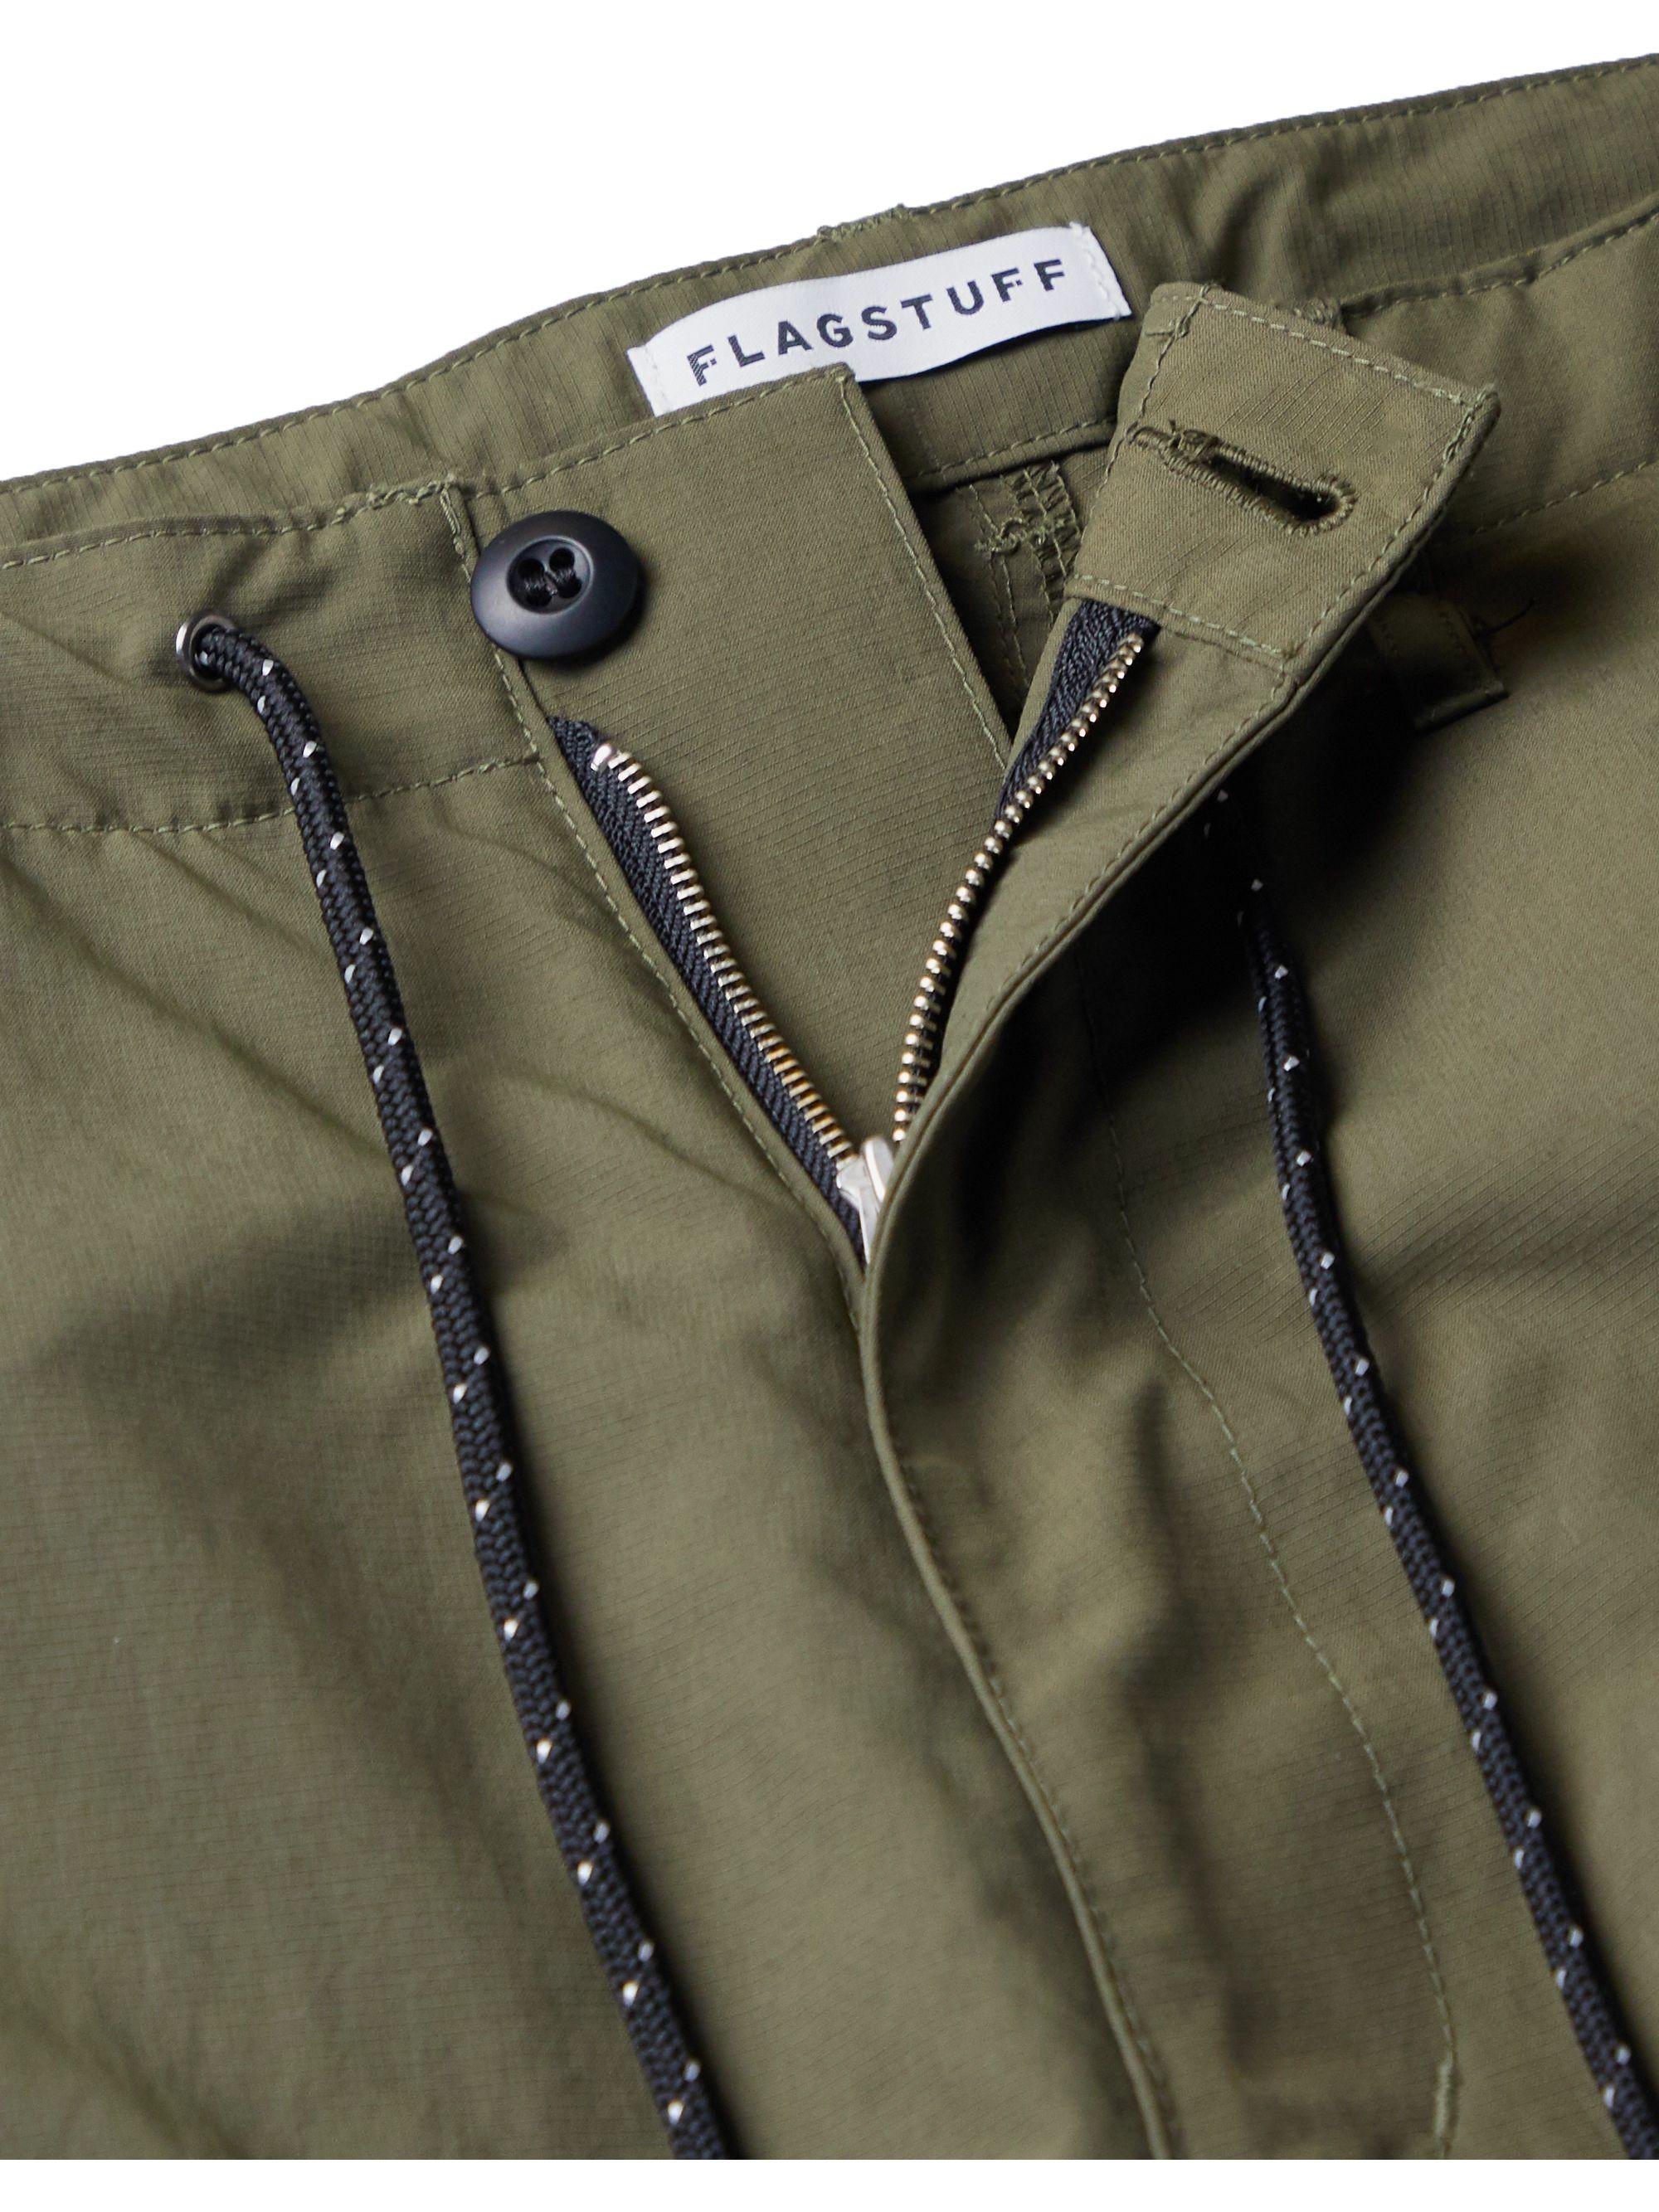 Army Green Wide-leg Webbing-trimmed Ripstop Cargo Trousers   Flagstuff